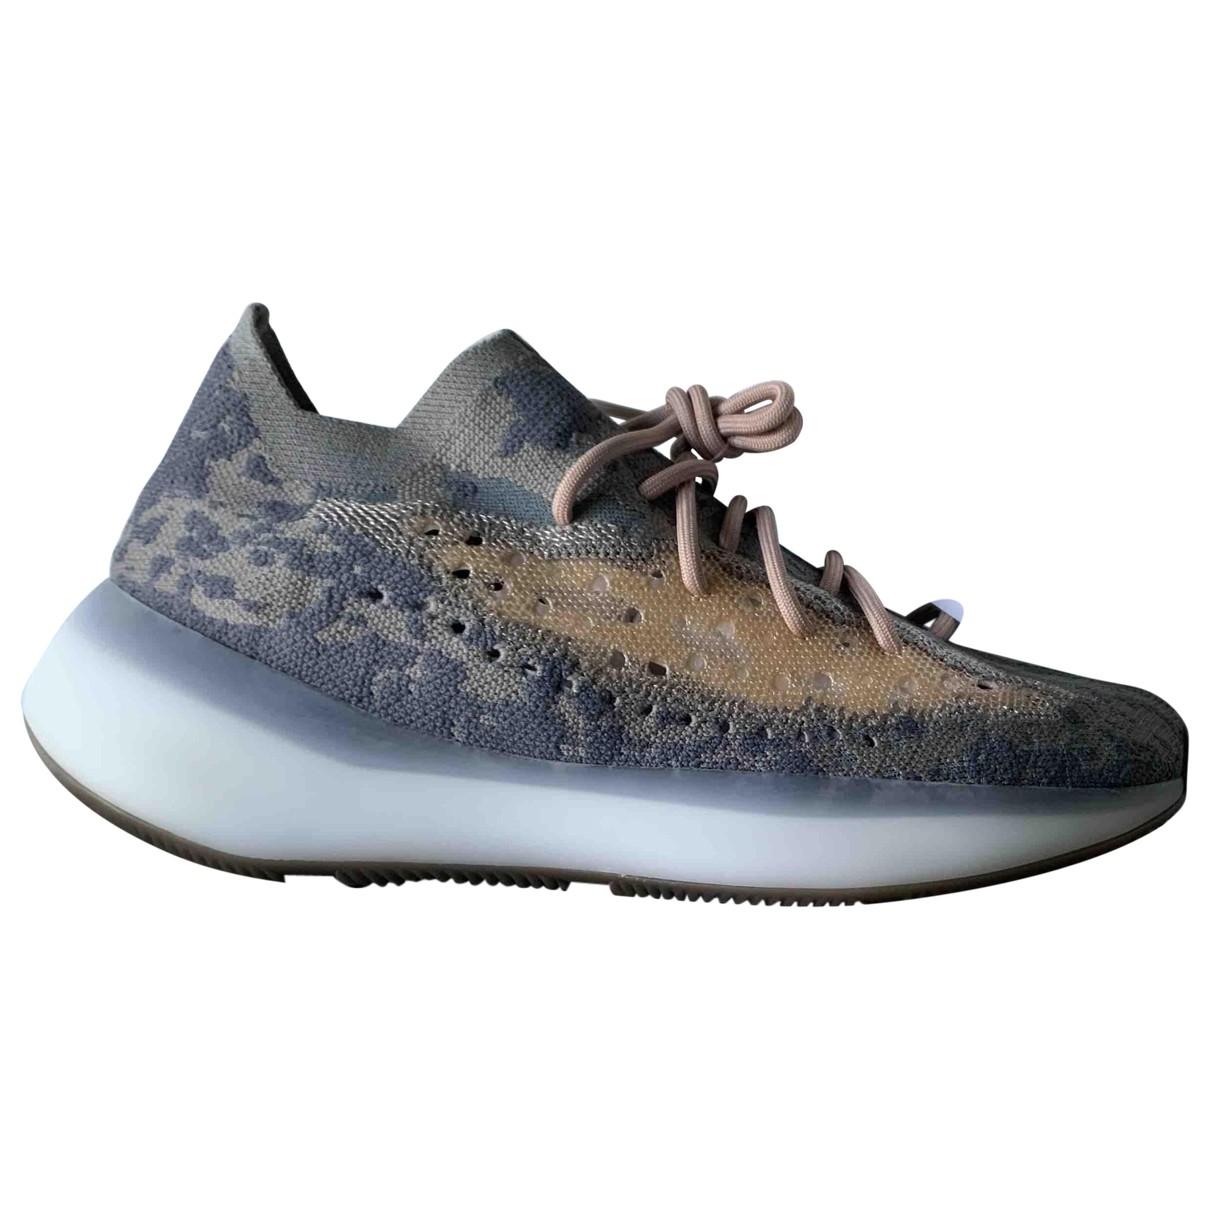 Yeezy X Adidas - Baskets Boost 380 pour homme en toile